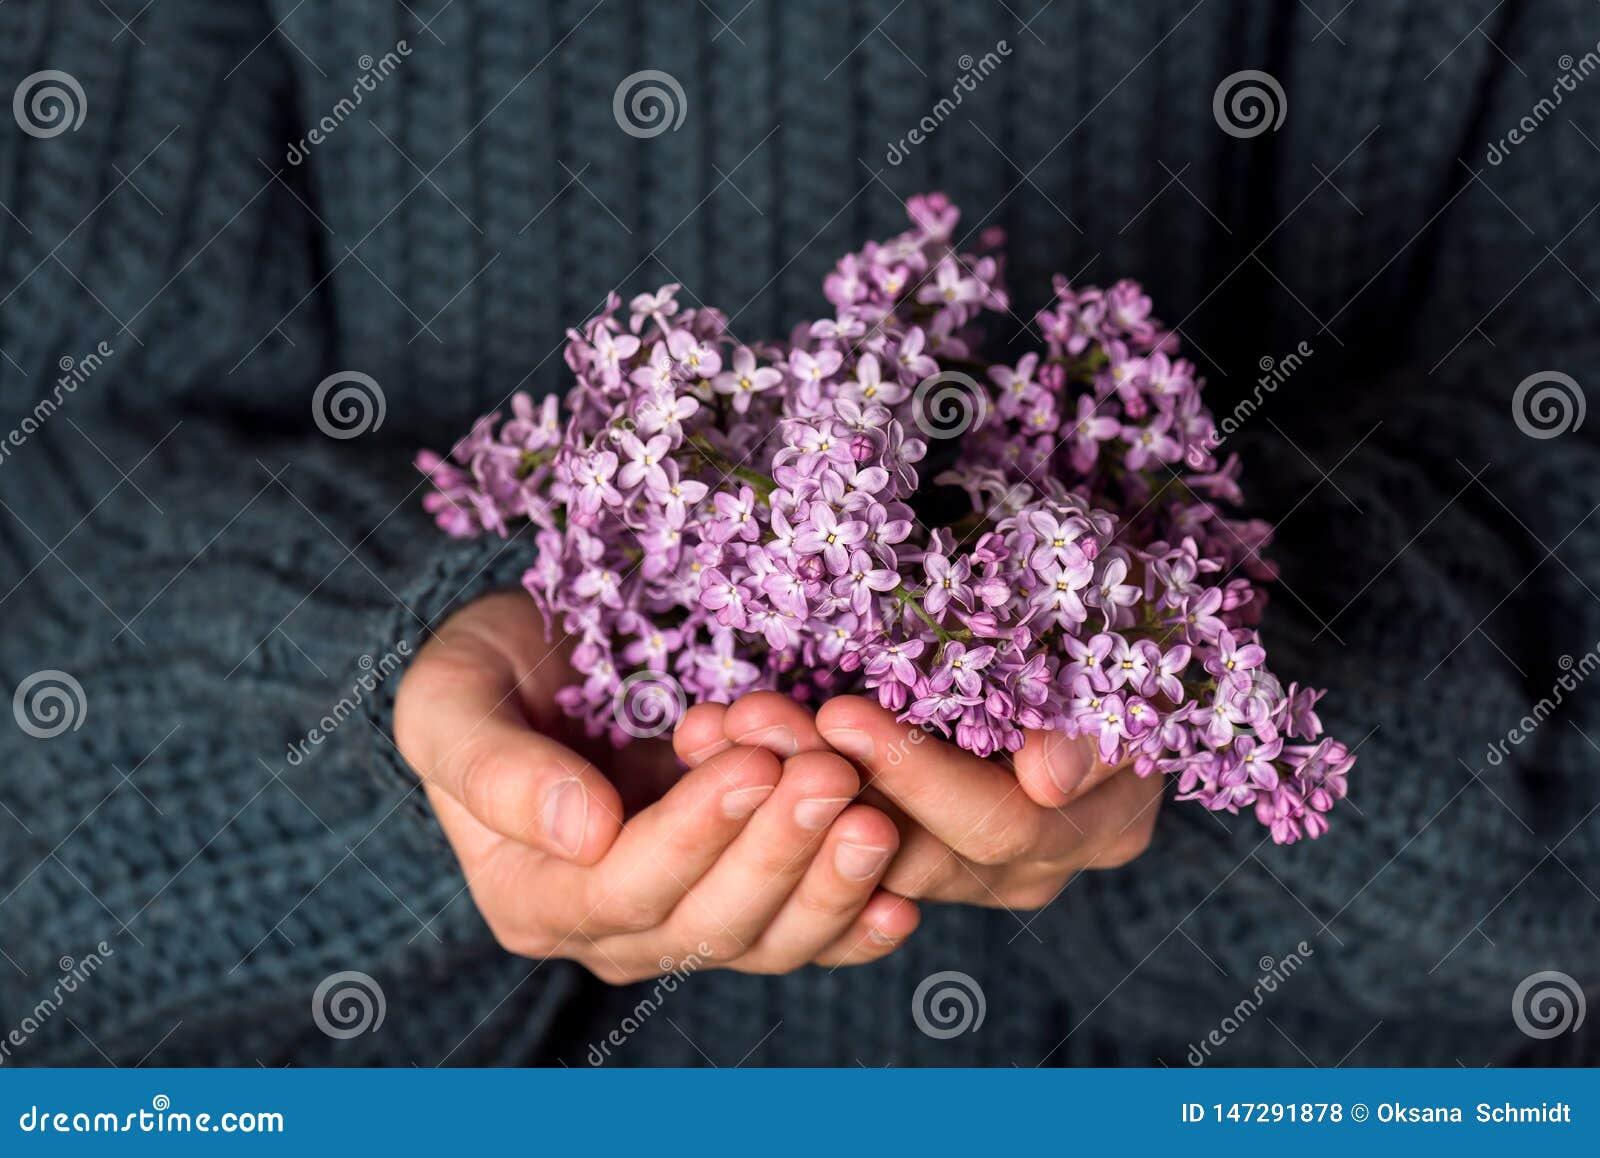 Beautiful bouquet of purple lilac flowers in girls hands.